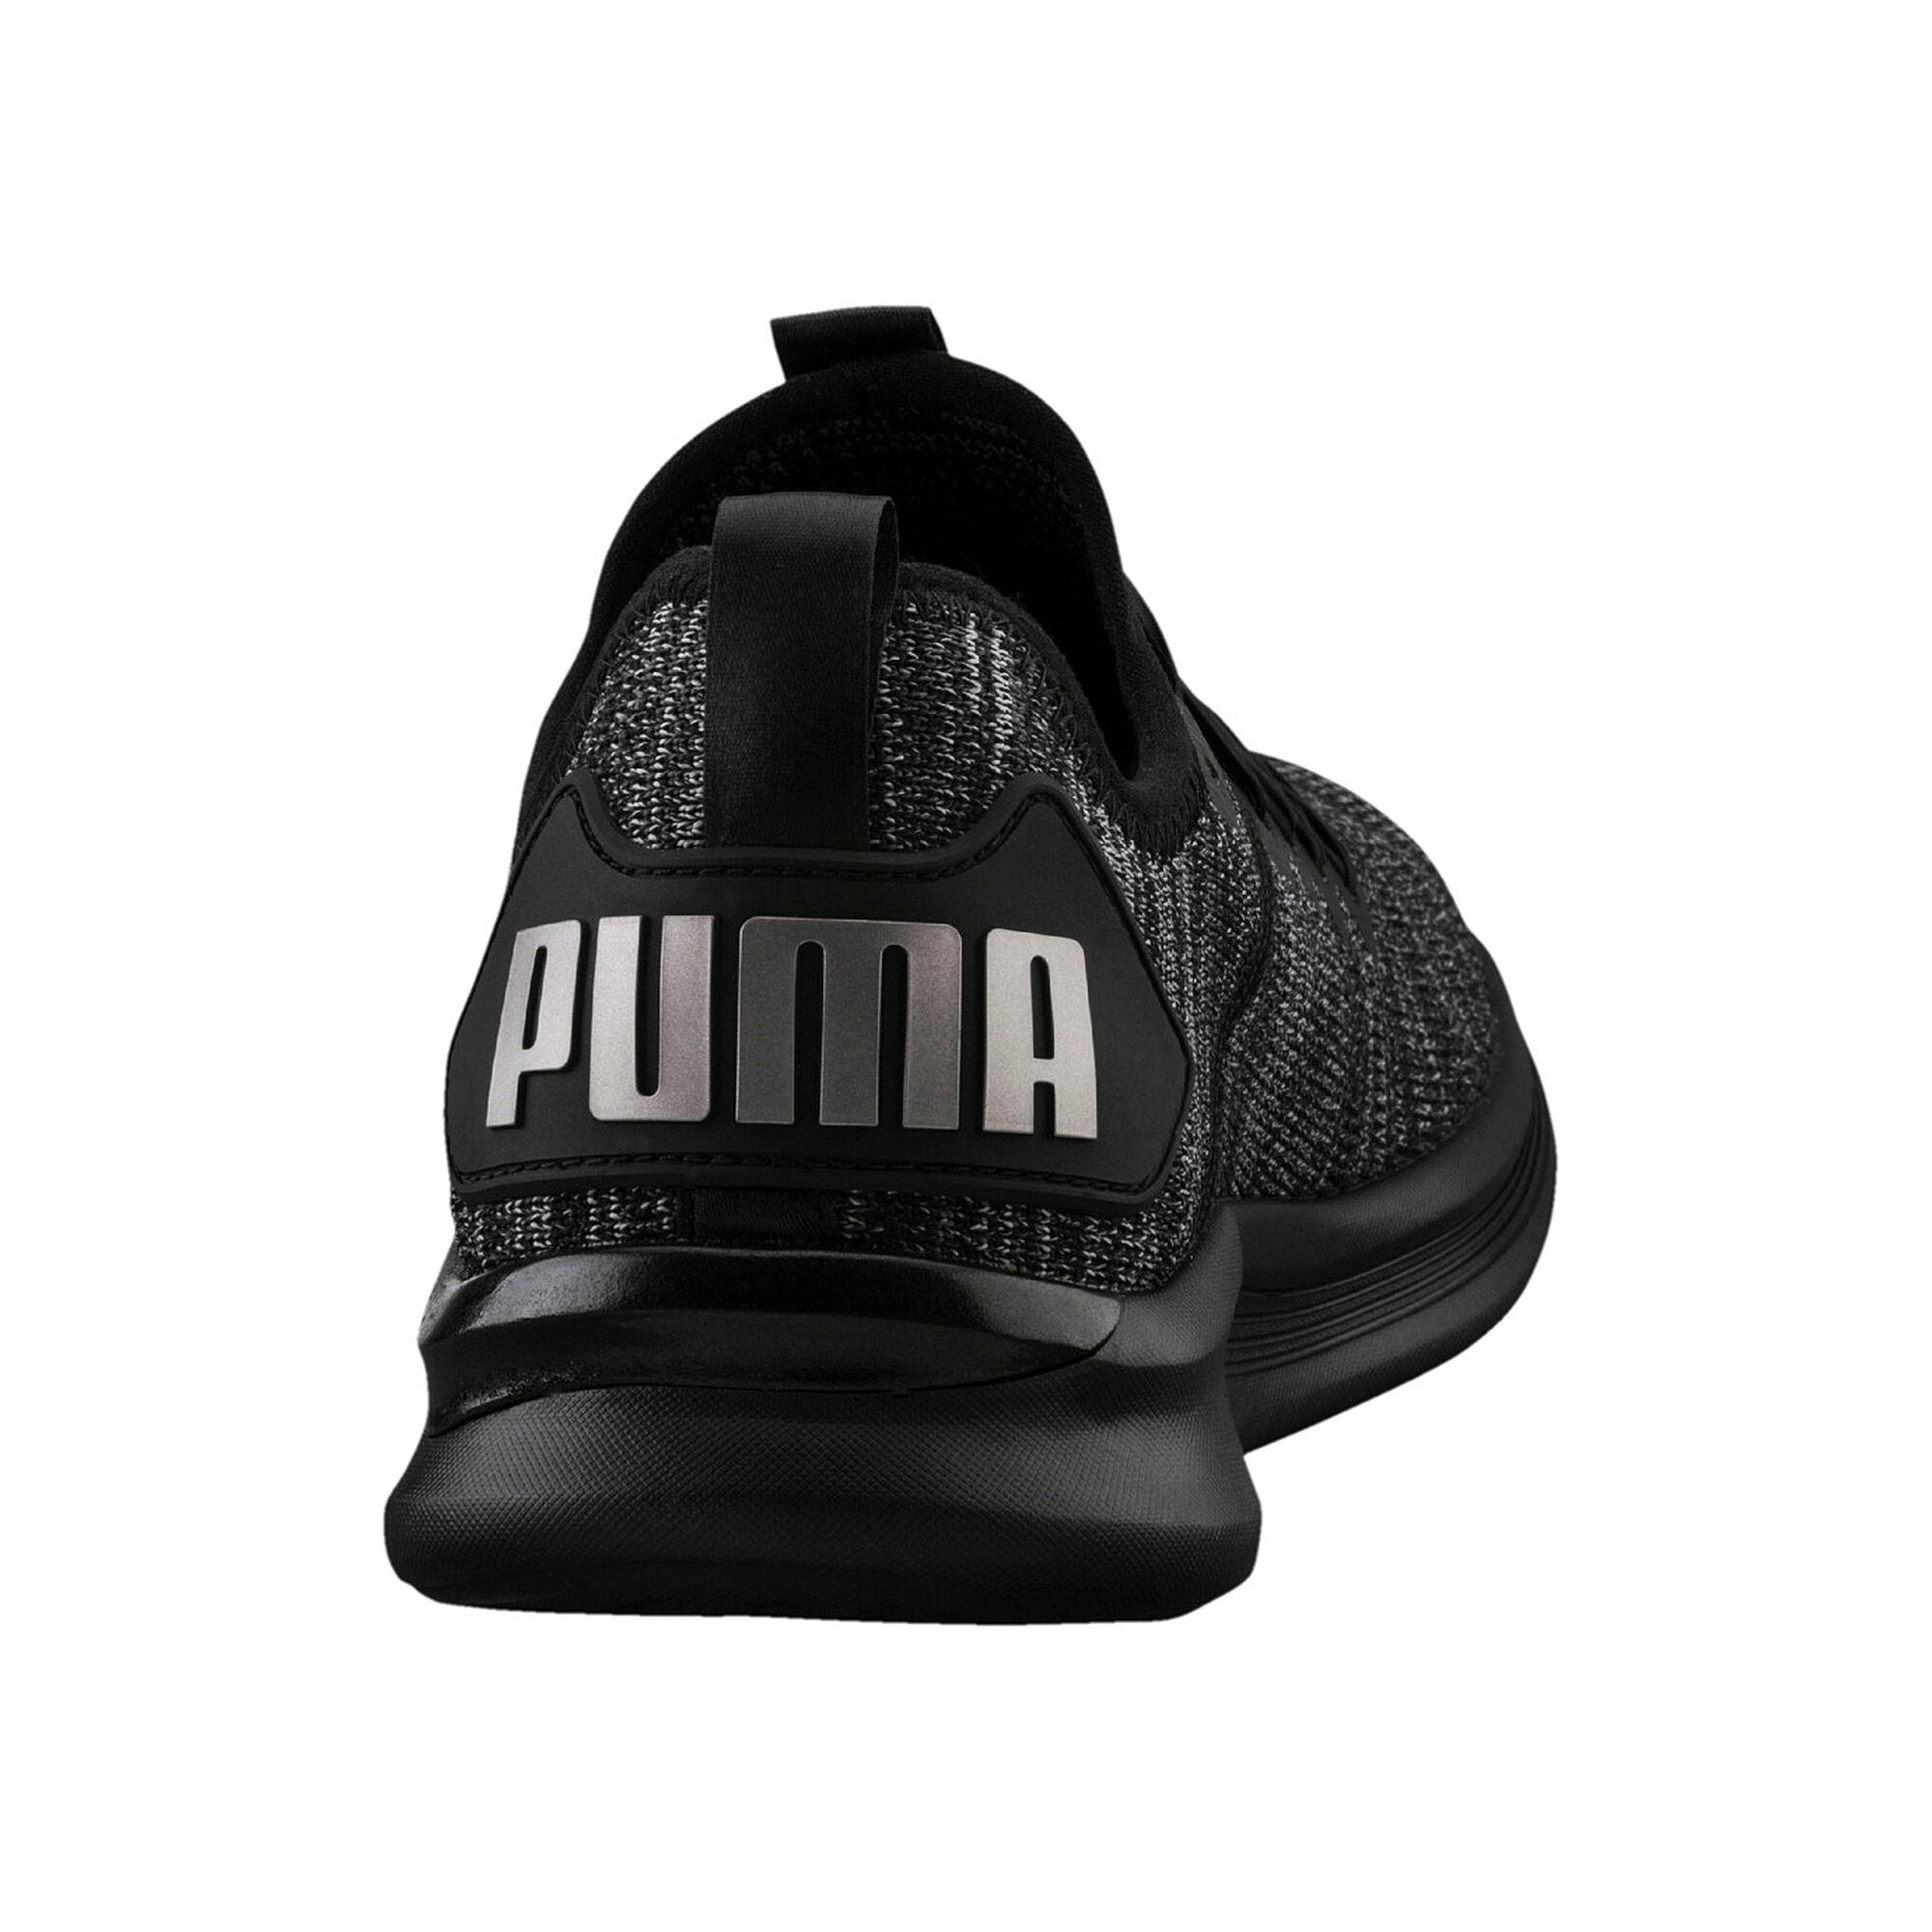 26d802b711d1 Puma  Puma  Puma  Puma  Puma  Puma  Puma. Ignite Flash EvoKNIT Satin EP  Women ...